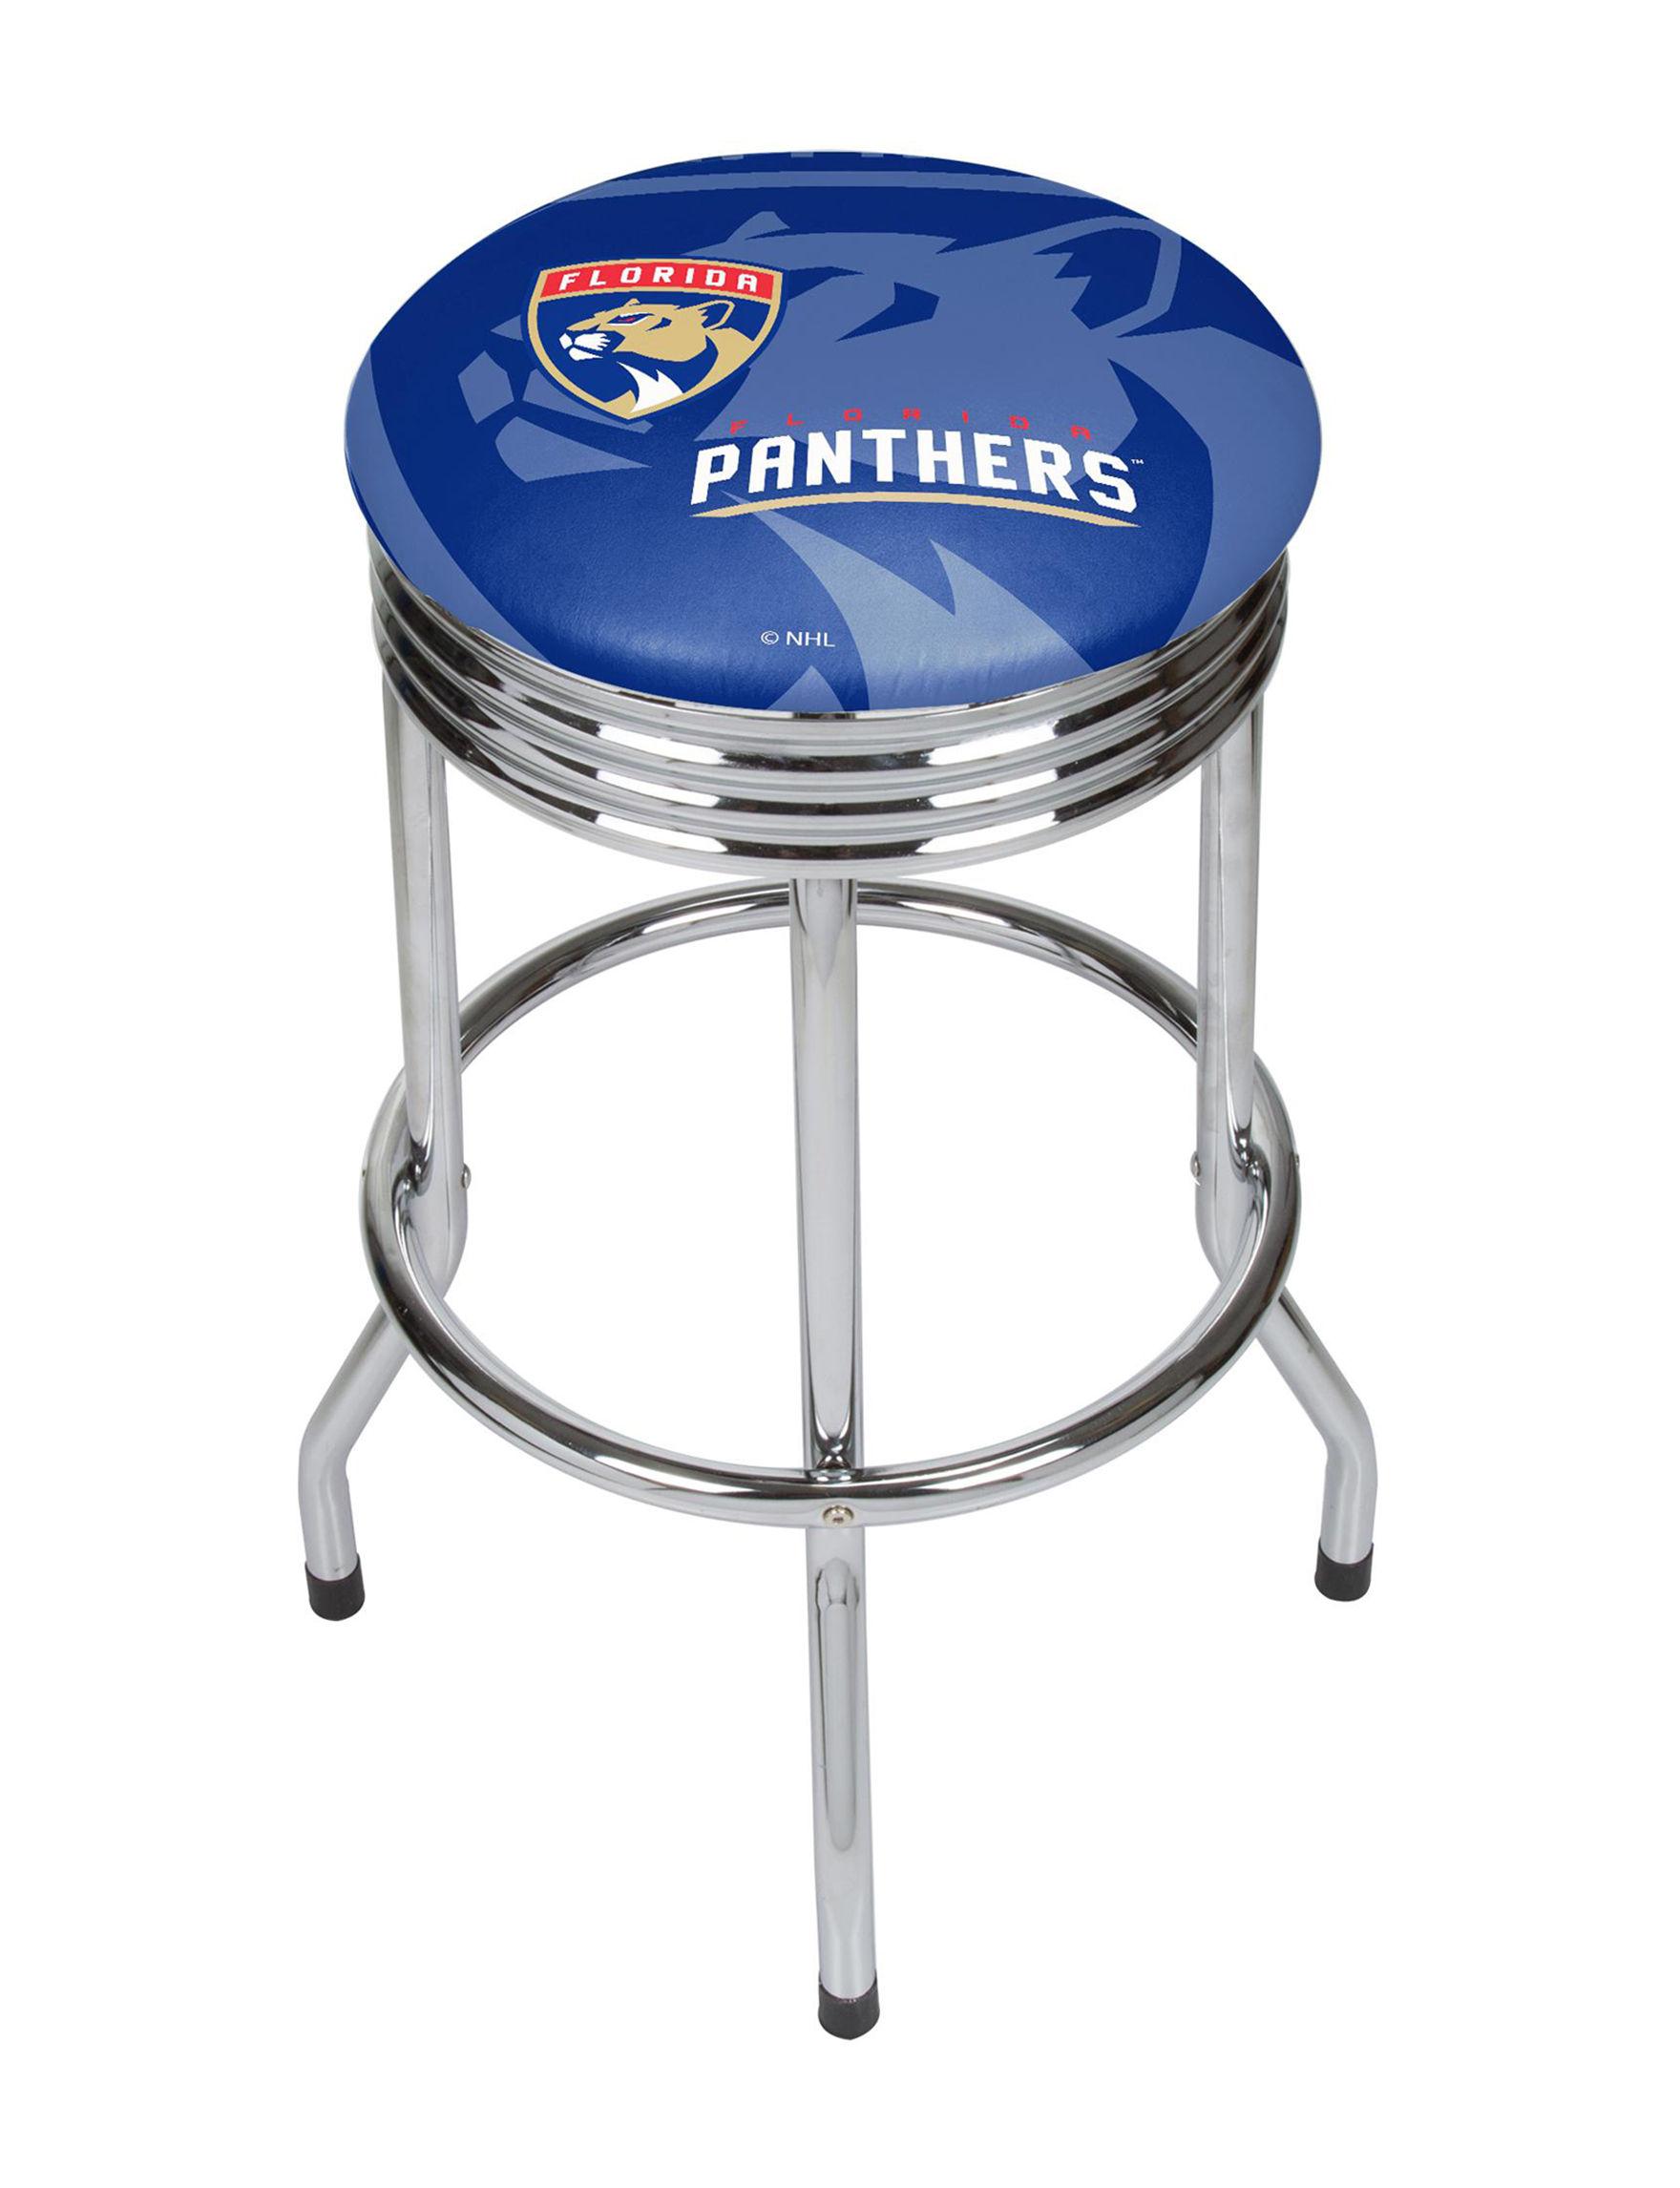 NHL Red / White / Blue Bar & Kitchen Stools Kitchen & Dining Furniture